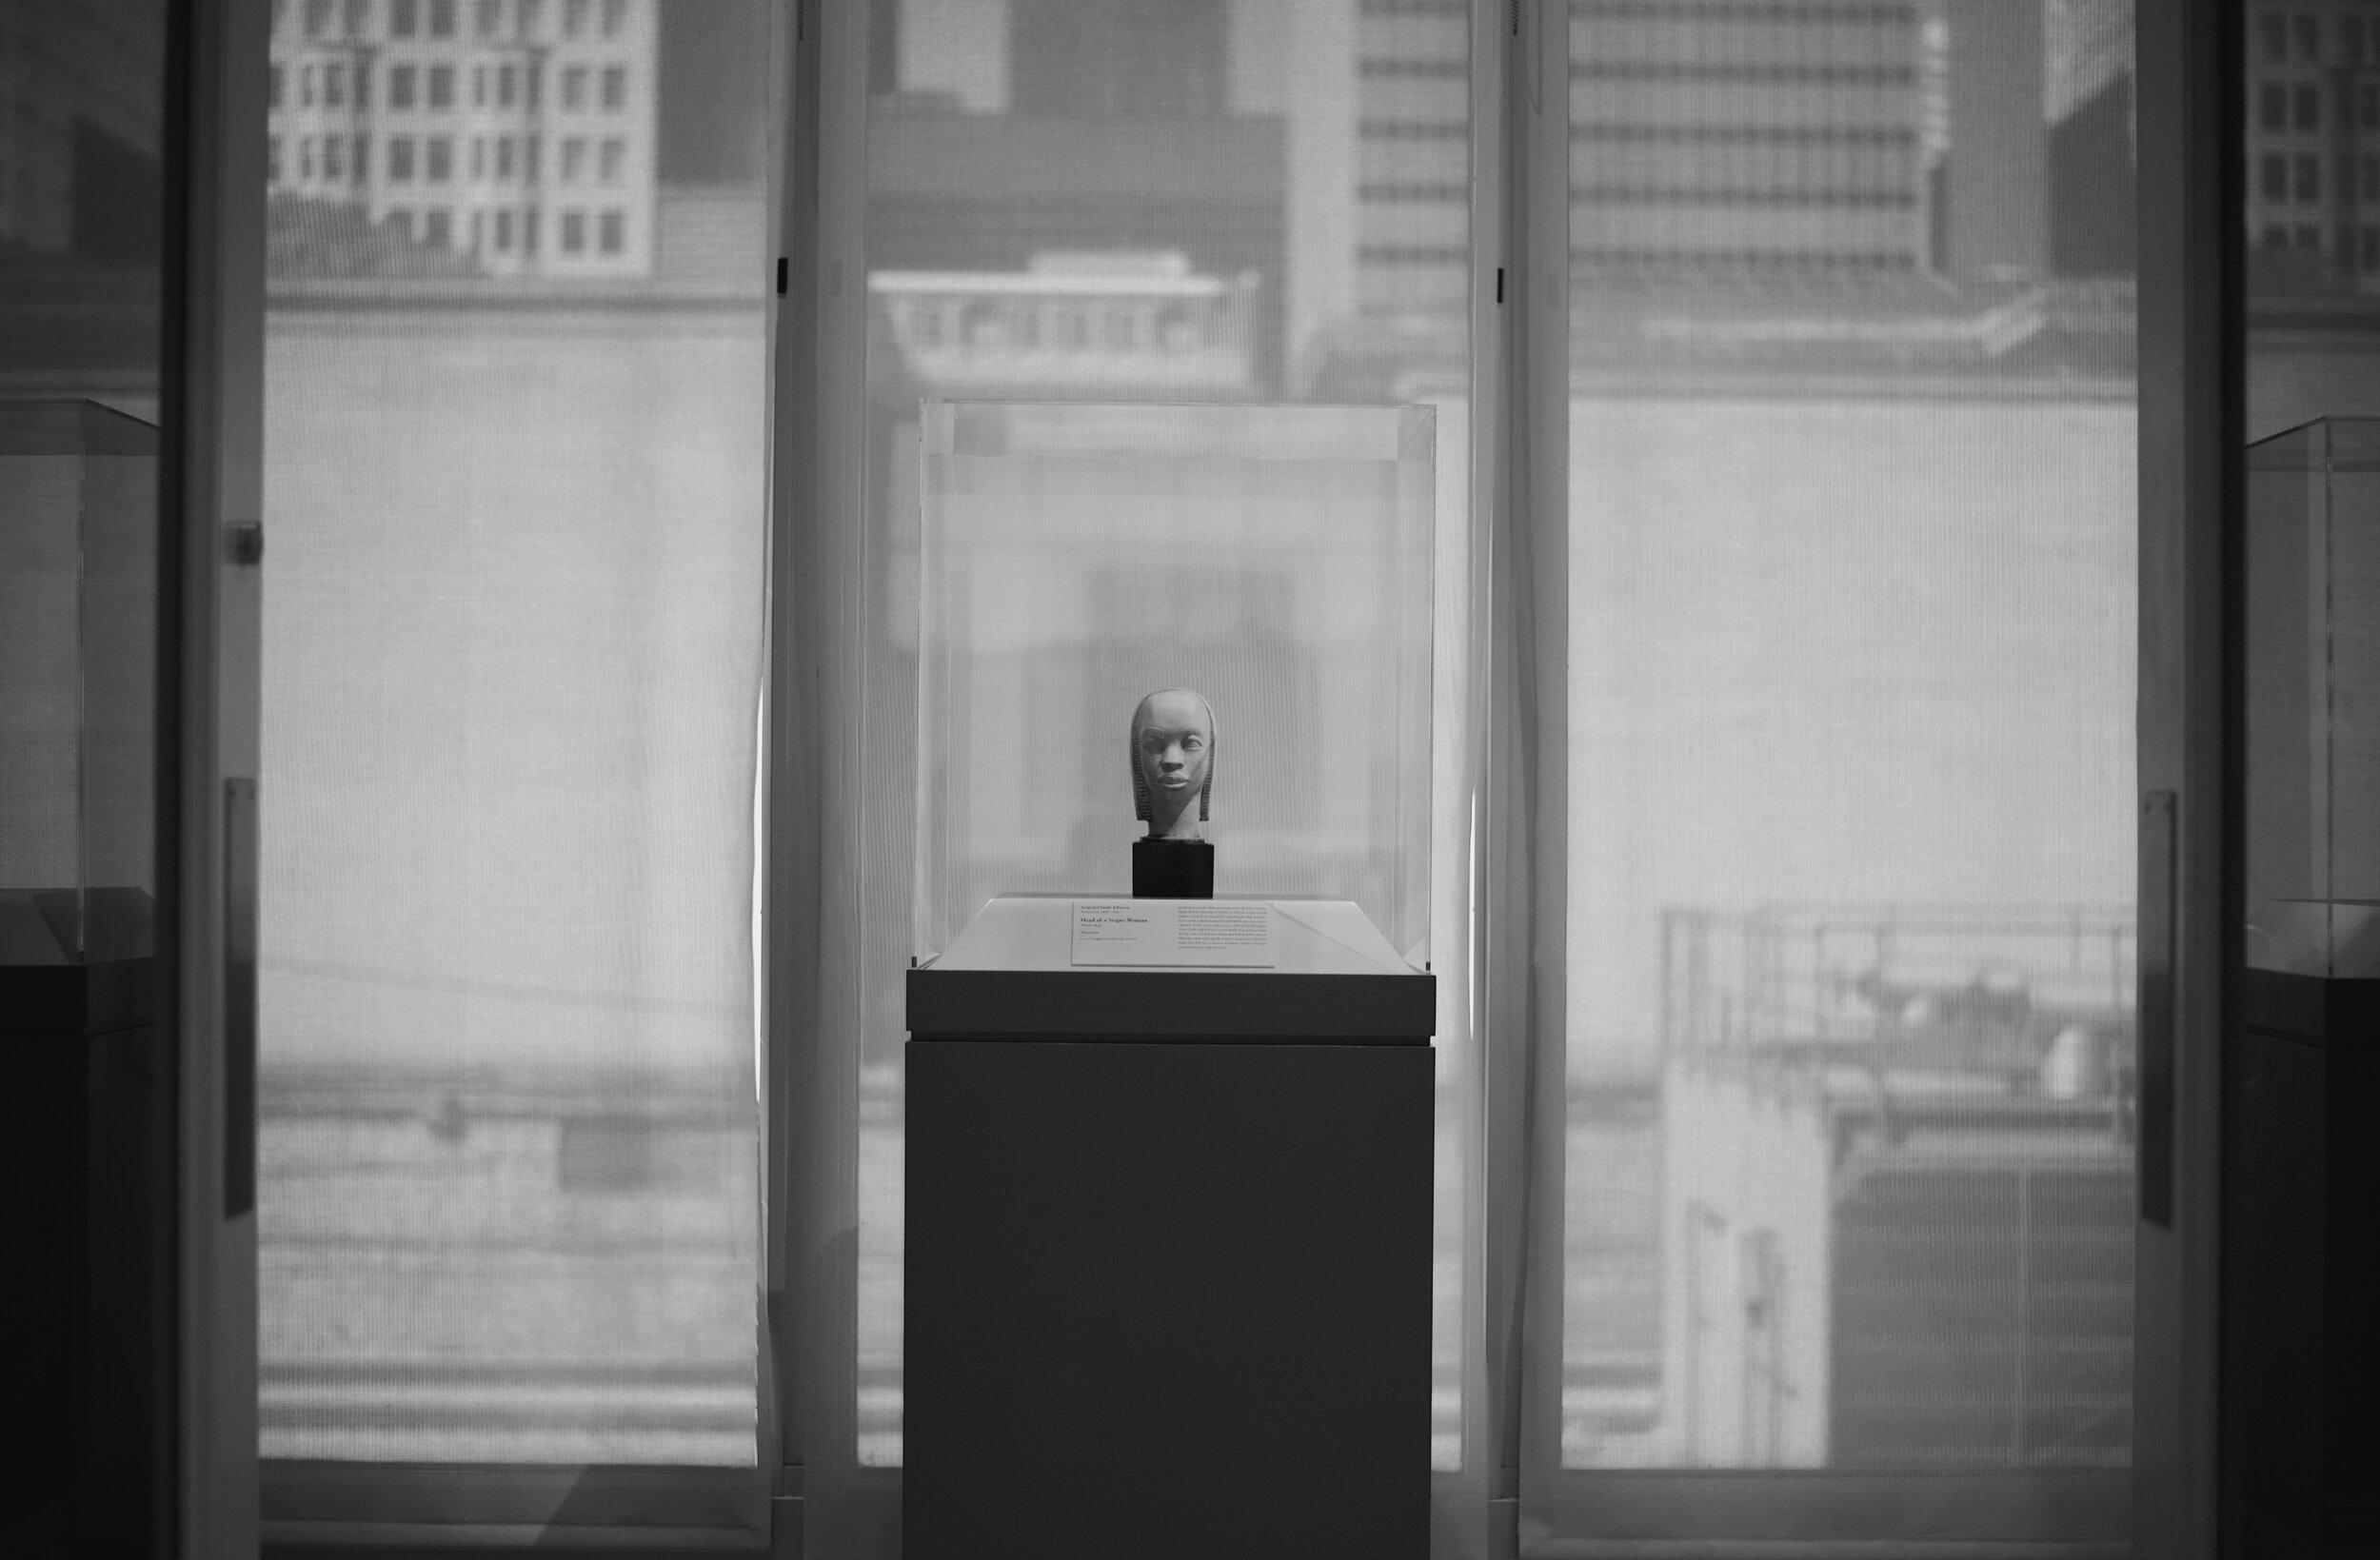 Display Case. Art Institute. Chicago, Illinois. September 2019. ©William D. Walker